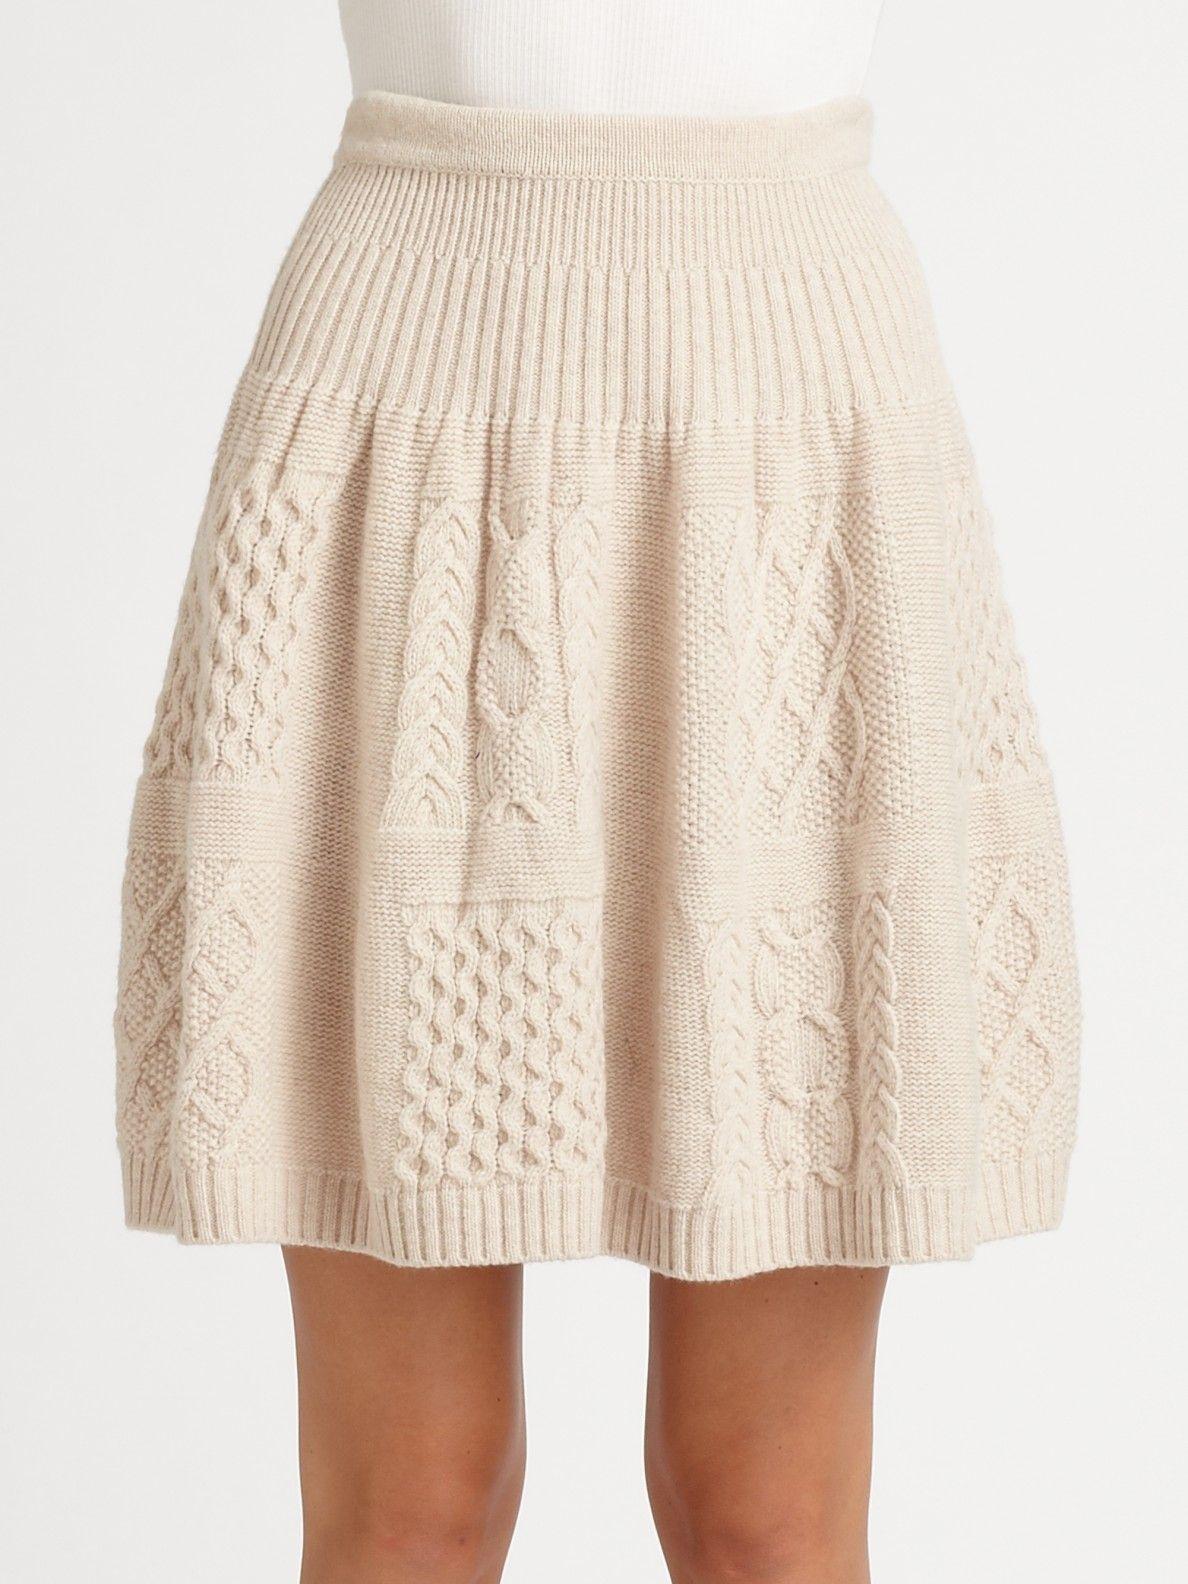 Womens natural glenda cableknit skirt knit crochet yarn womens natural glenda cableknit skirt skirt patternsskirt pattern freeskirt knitting bankloansurffo Images